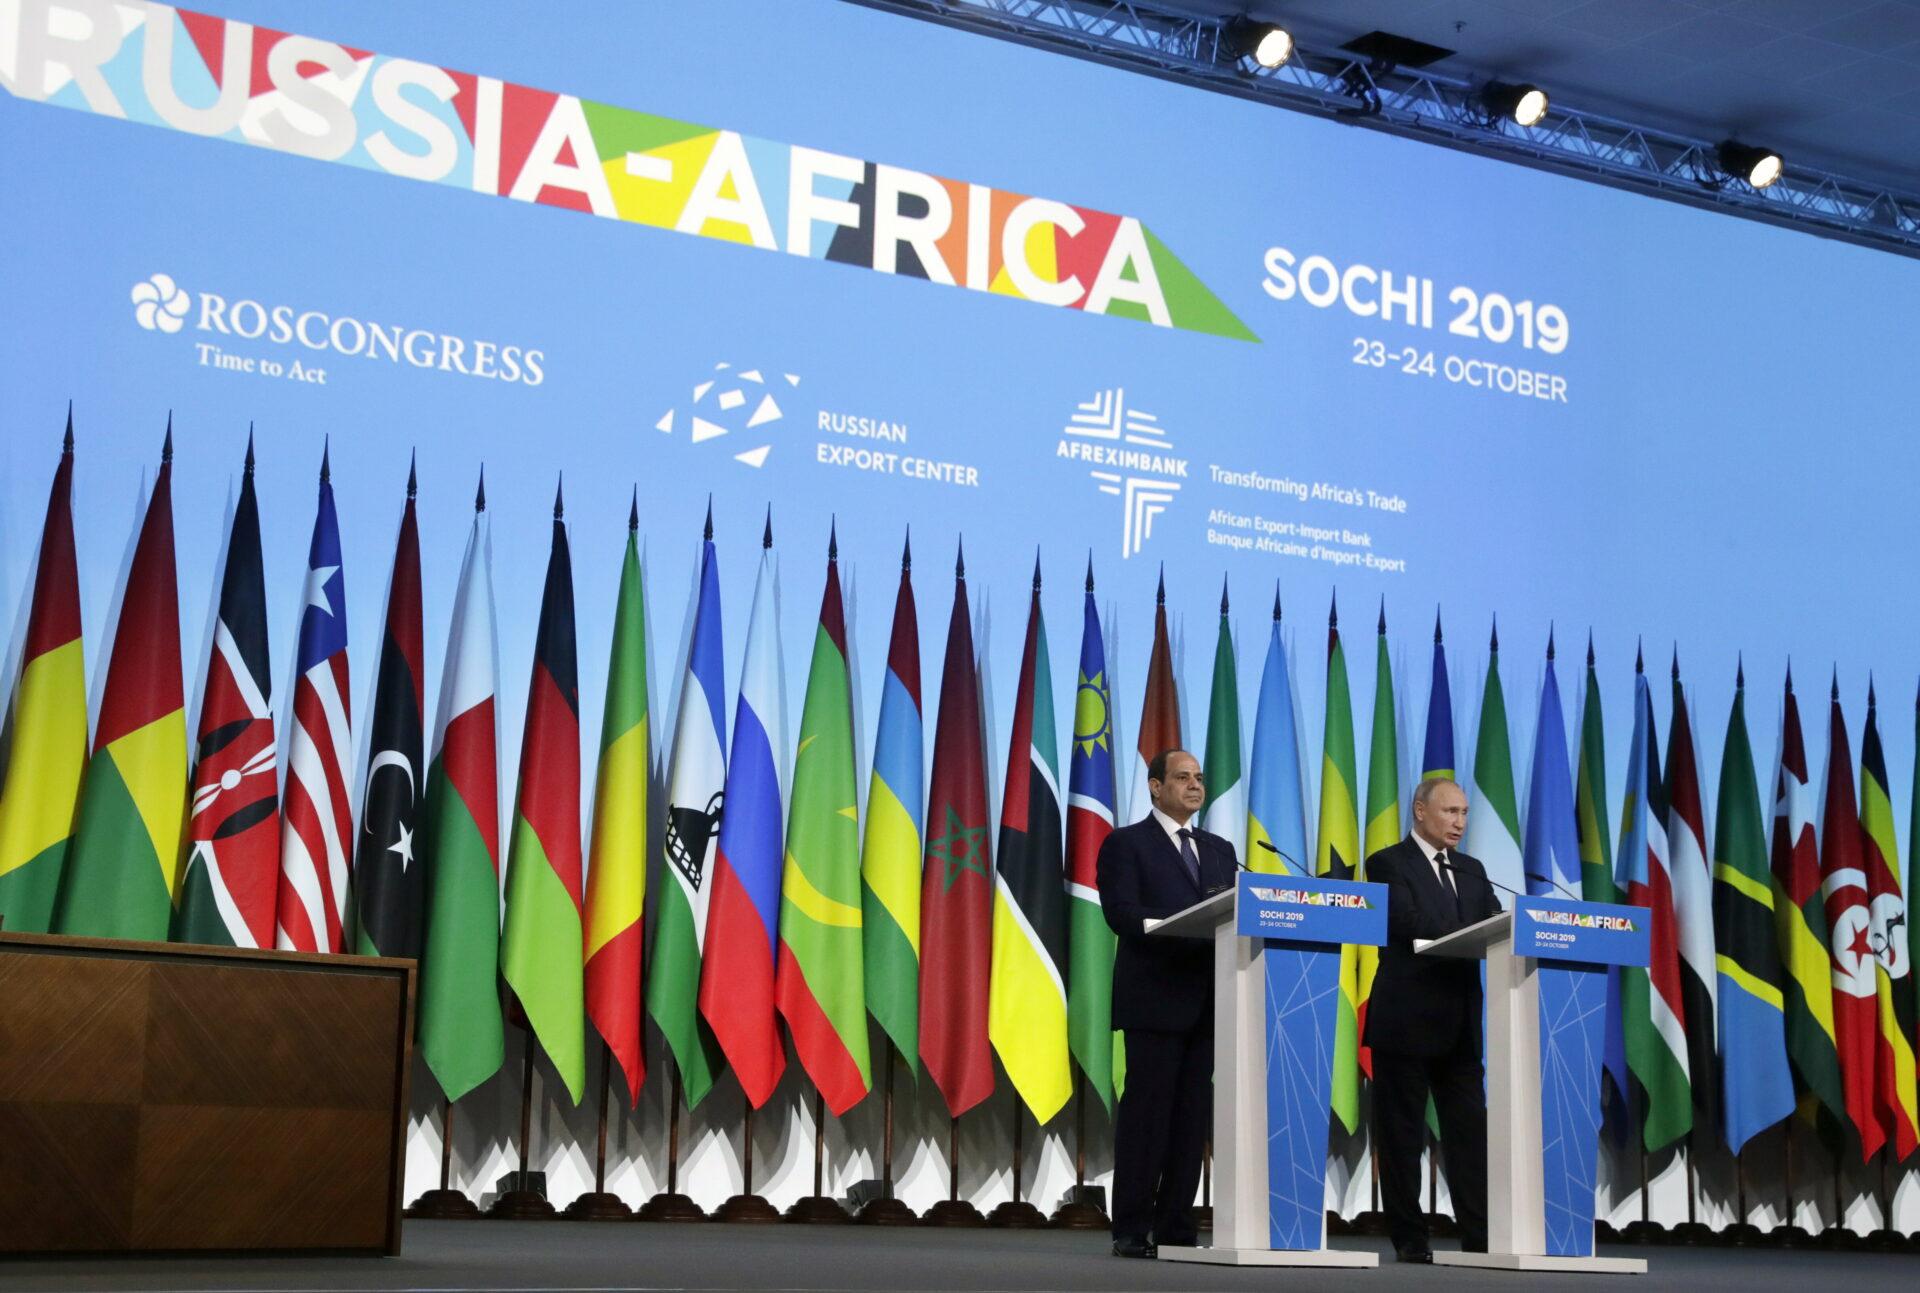 Sommet-Russie -Afrique - Jeunes UE-UA